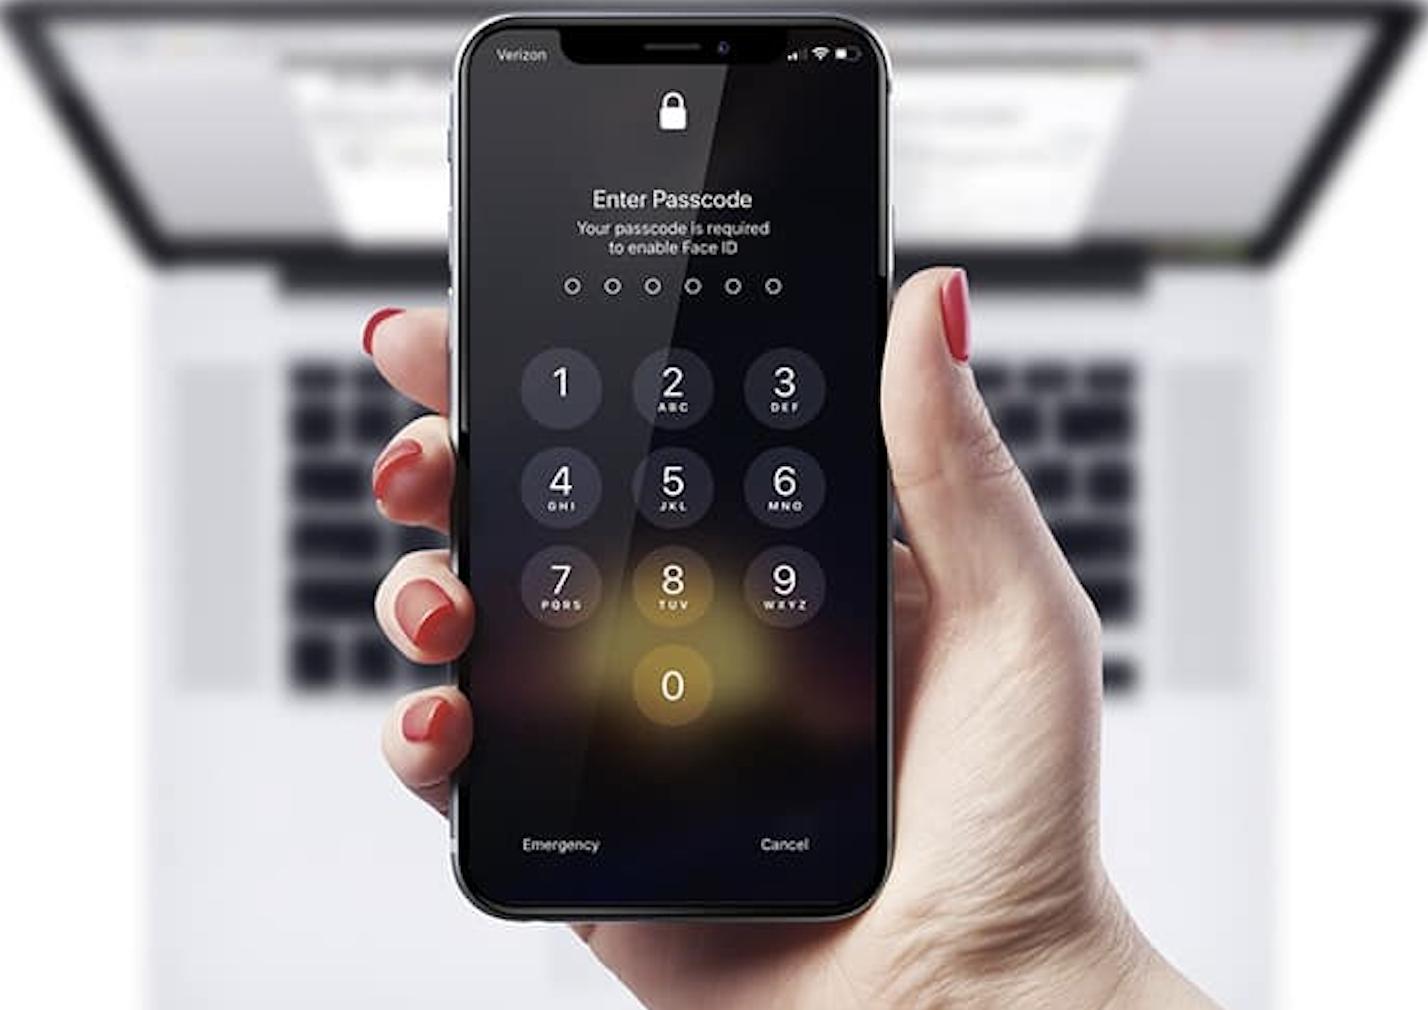 Forgotten Passcode? Here are 4 Ways to Unlock your iPhone